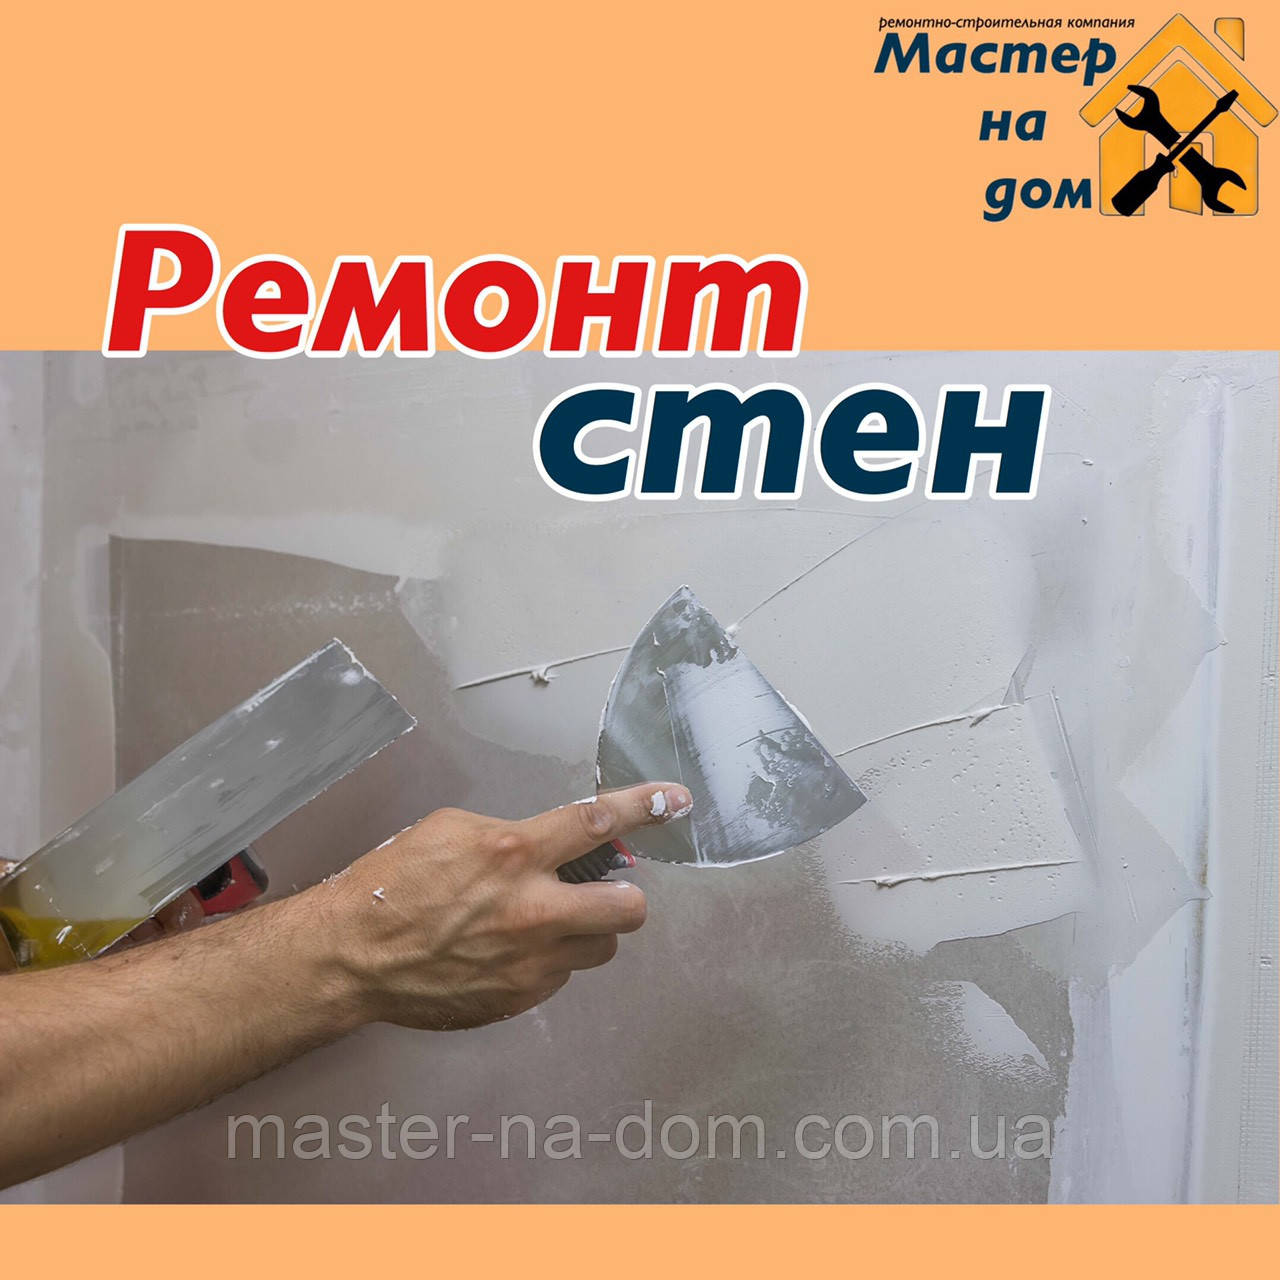 Ремонт и отделка стен в Кропивницком